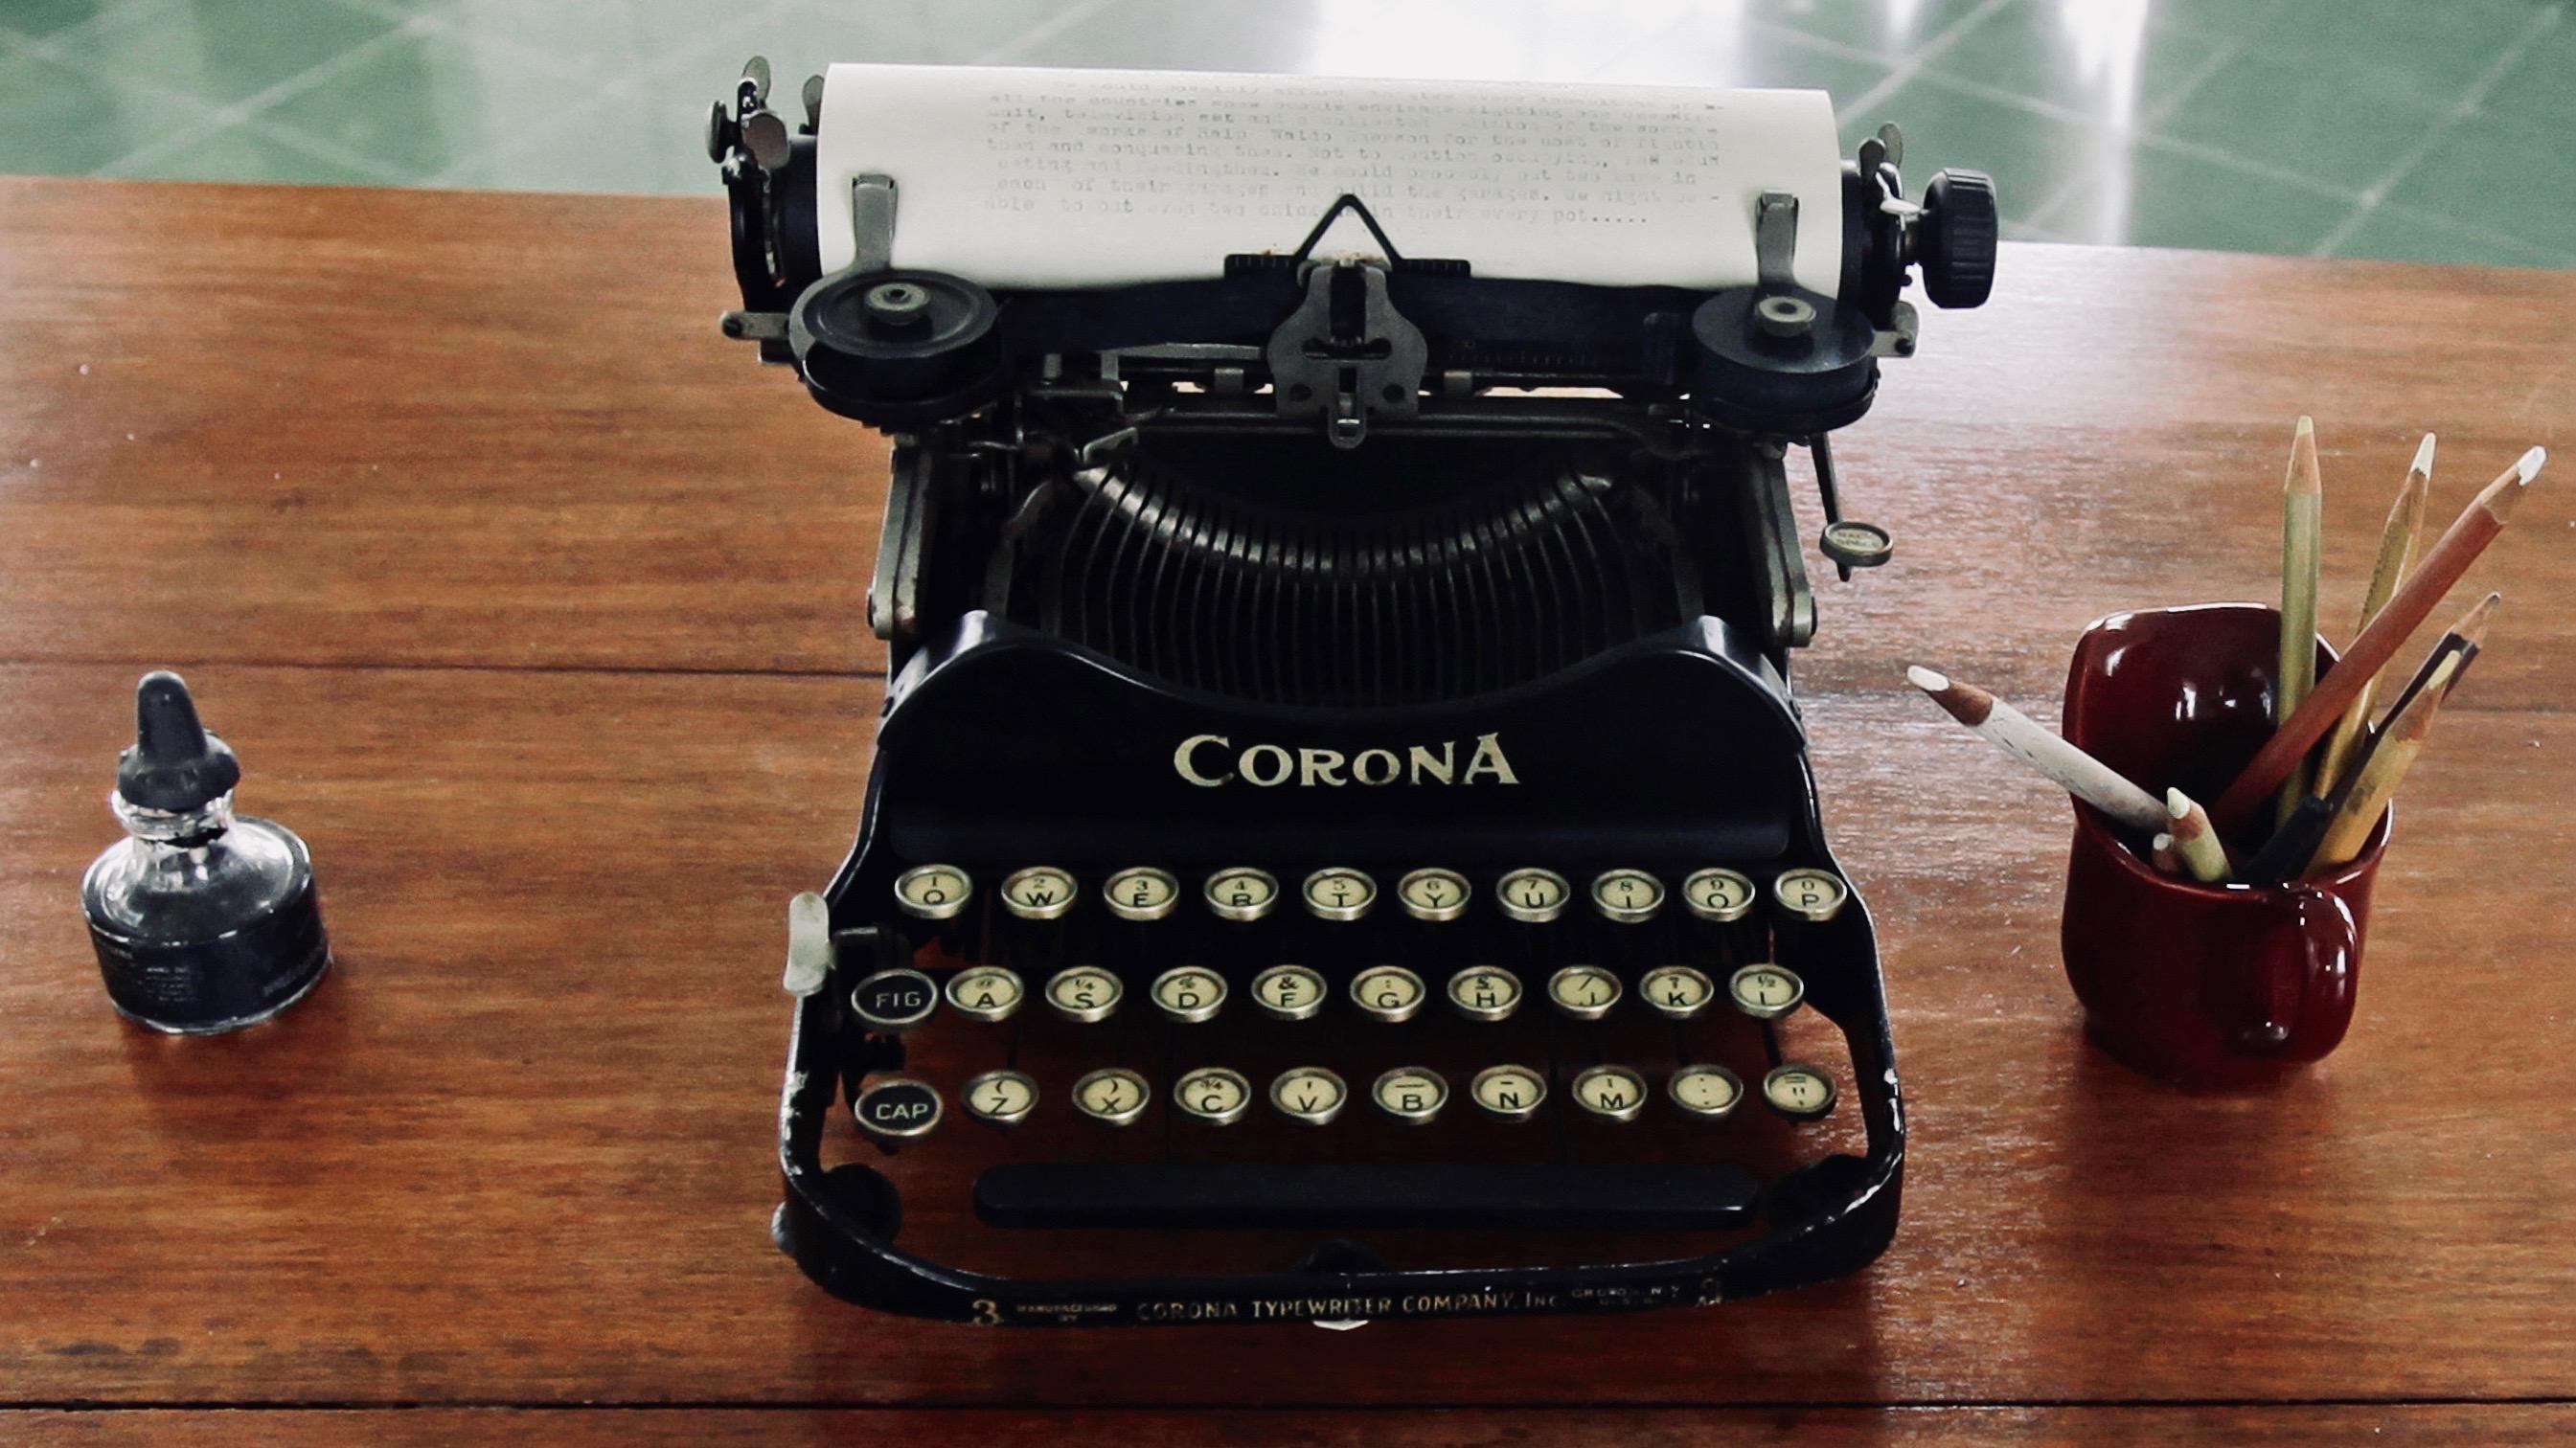 Ernest Hemingway's typewriter and pencils.